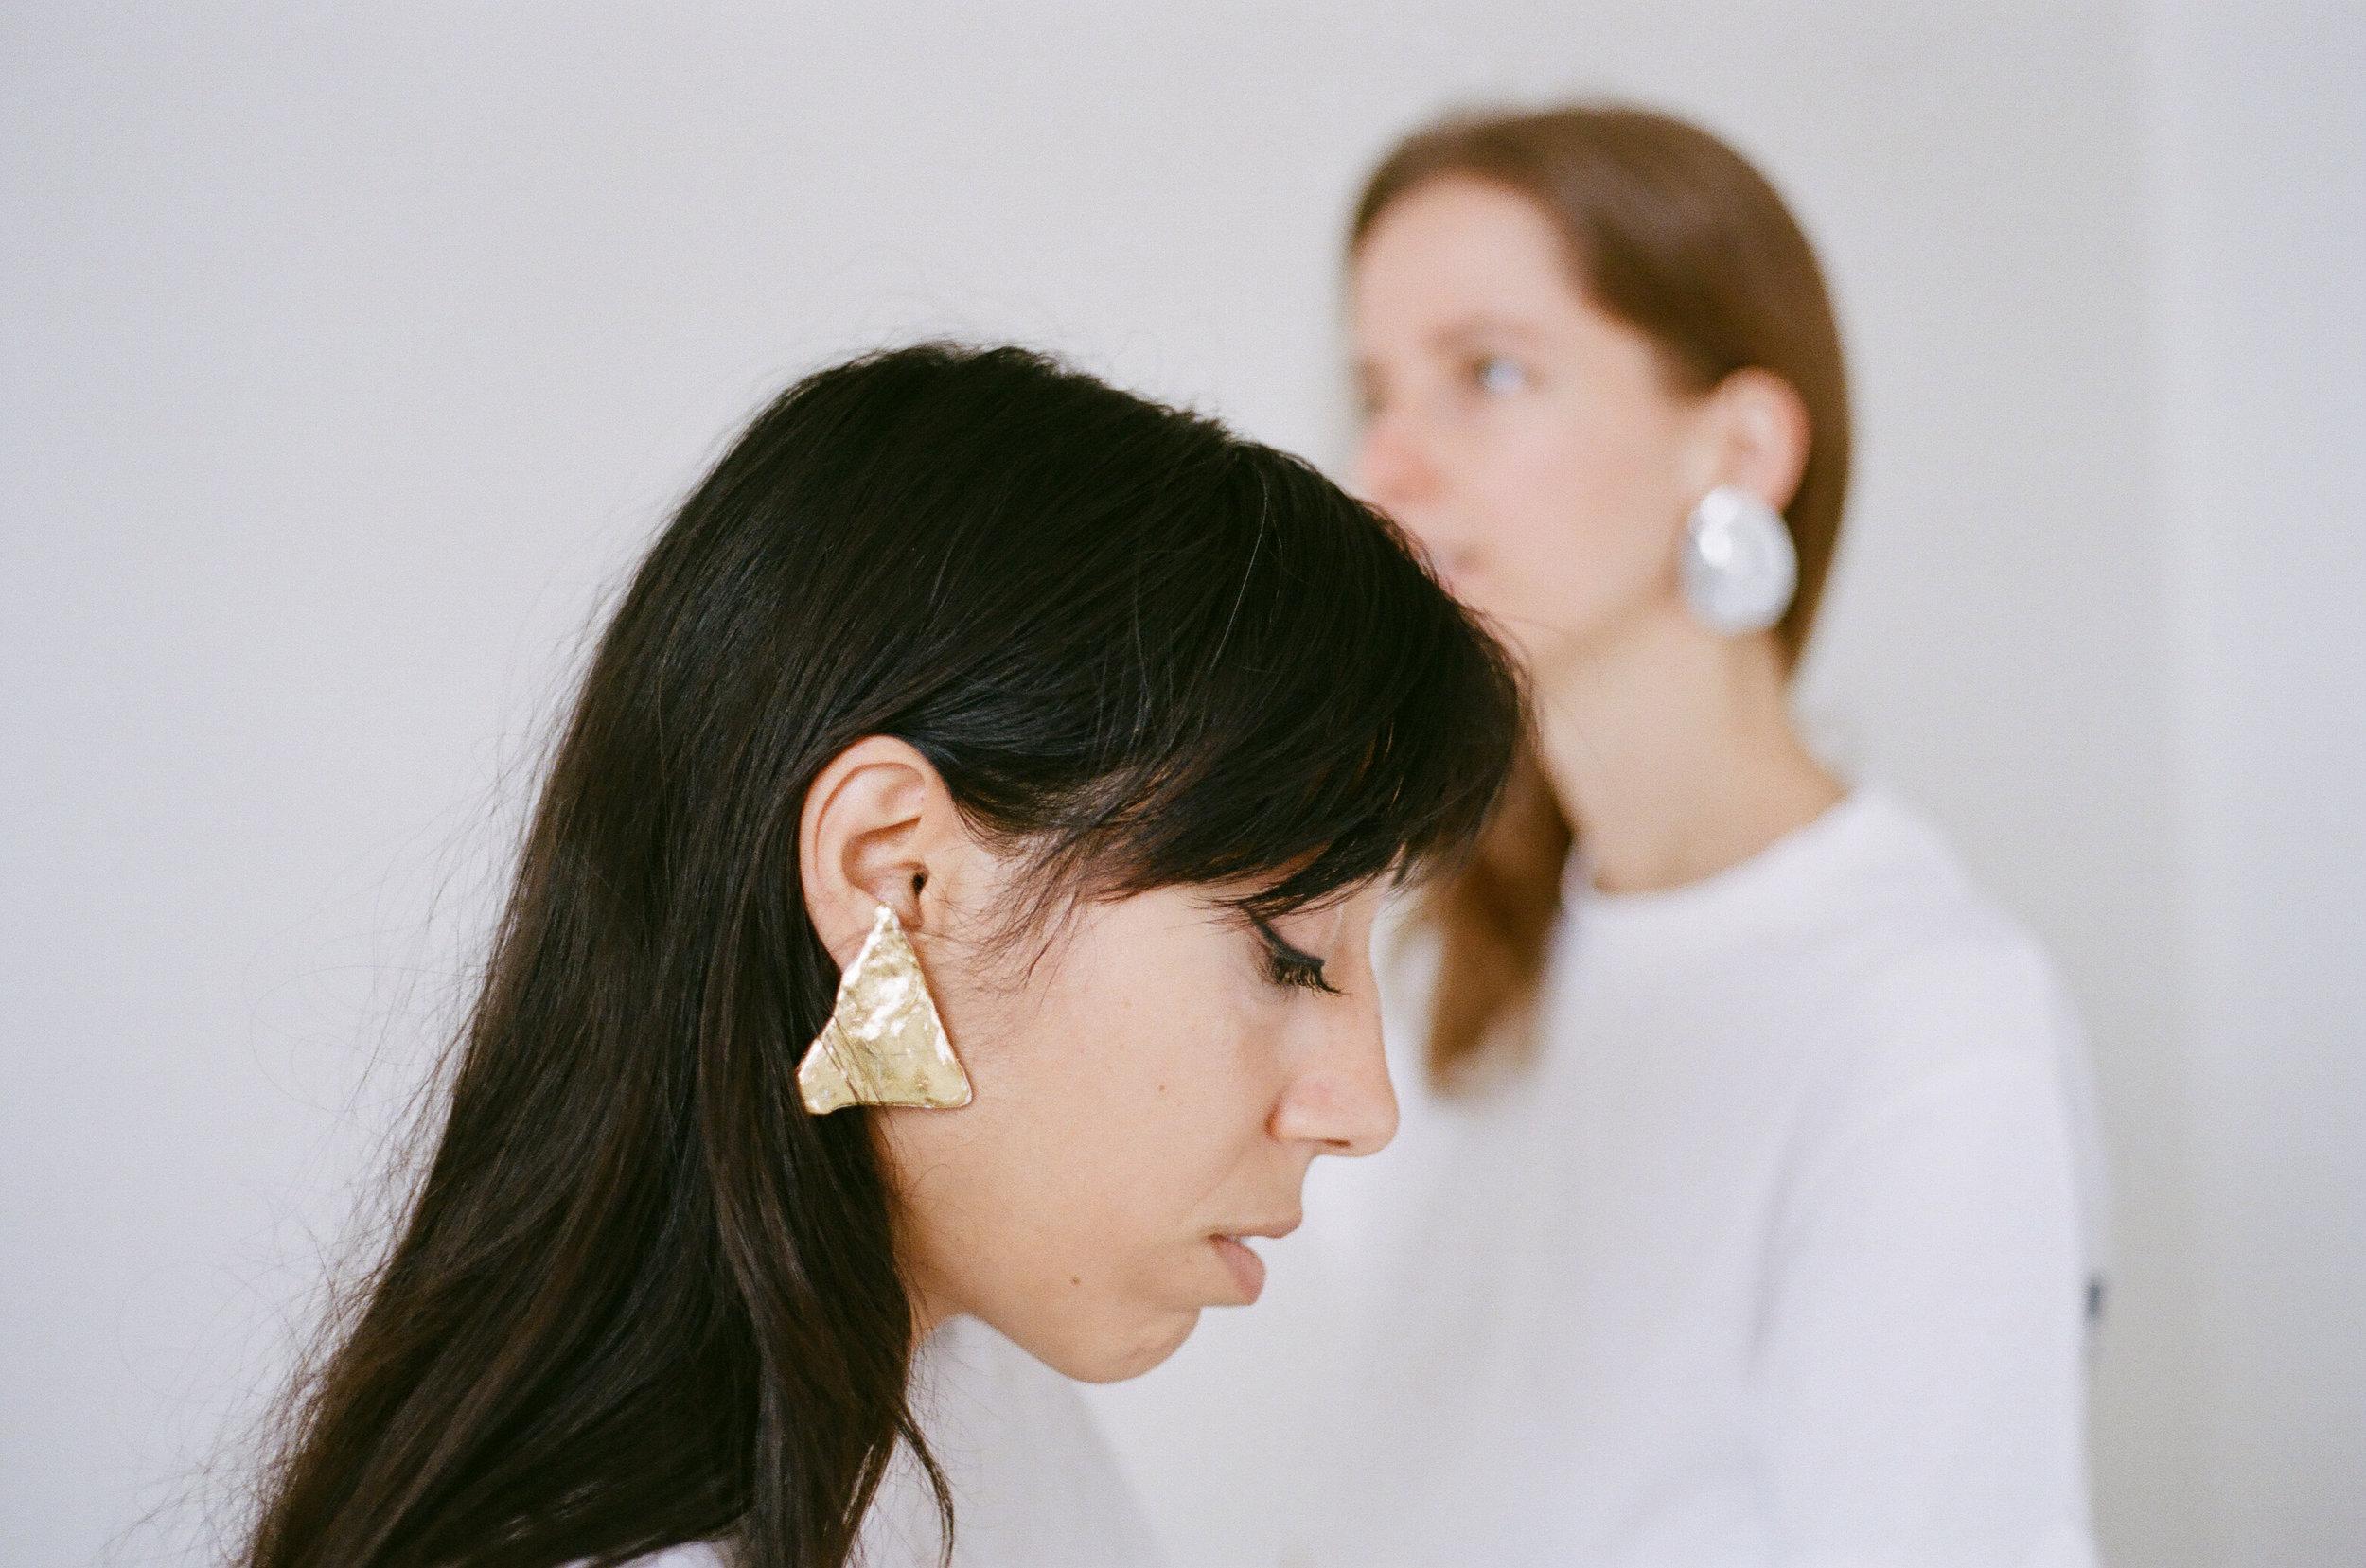 georgia-hilmer-monica-hofstadter-dominika-mazurova-doucement-jewelry-1.jpg